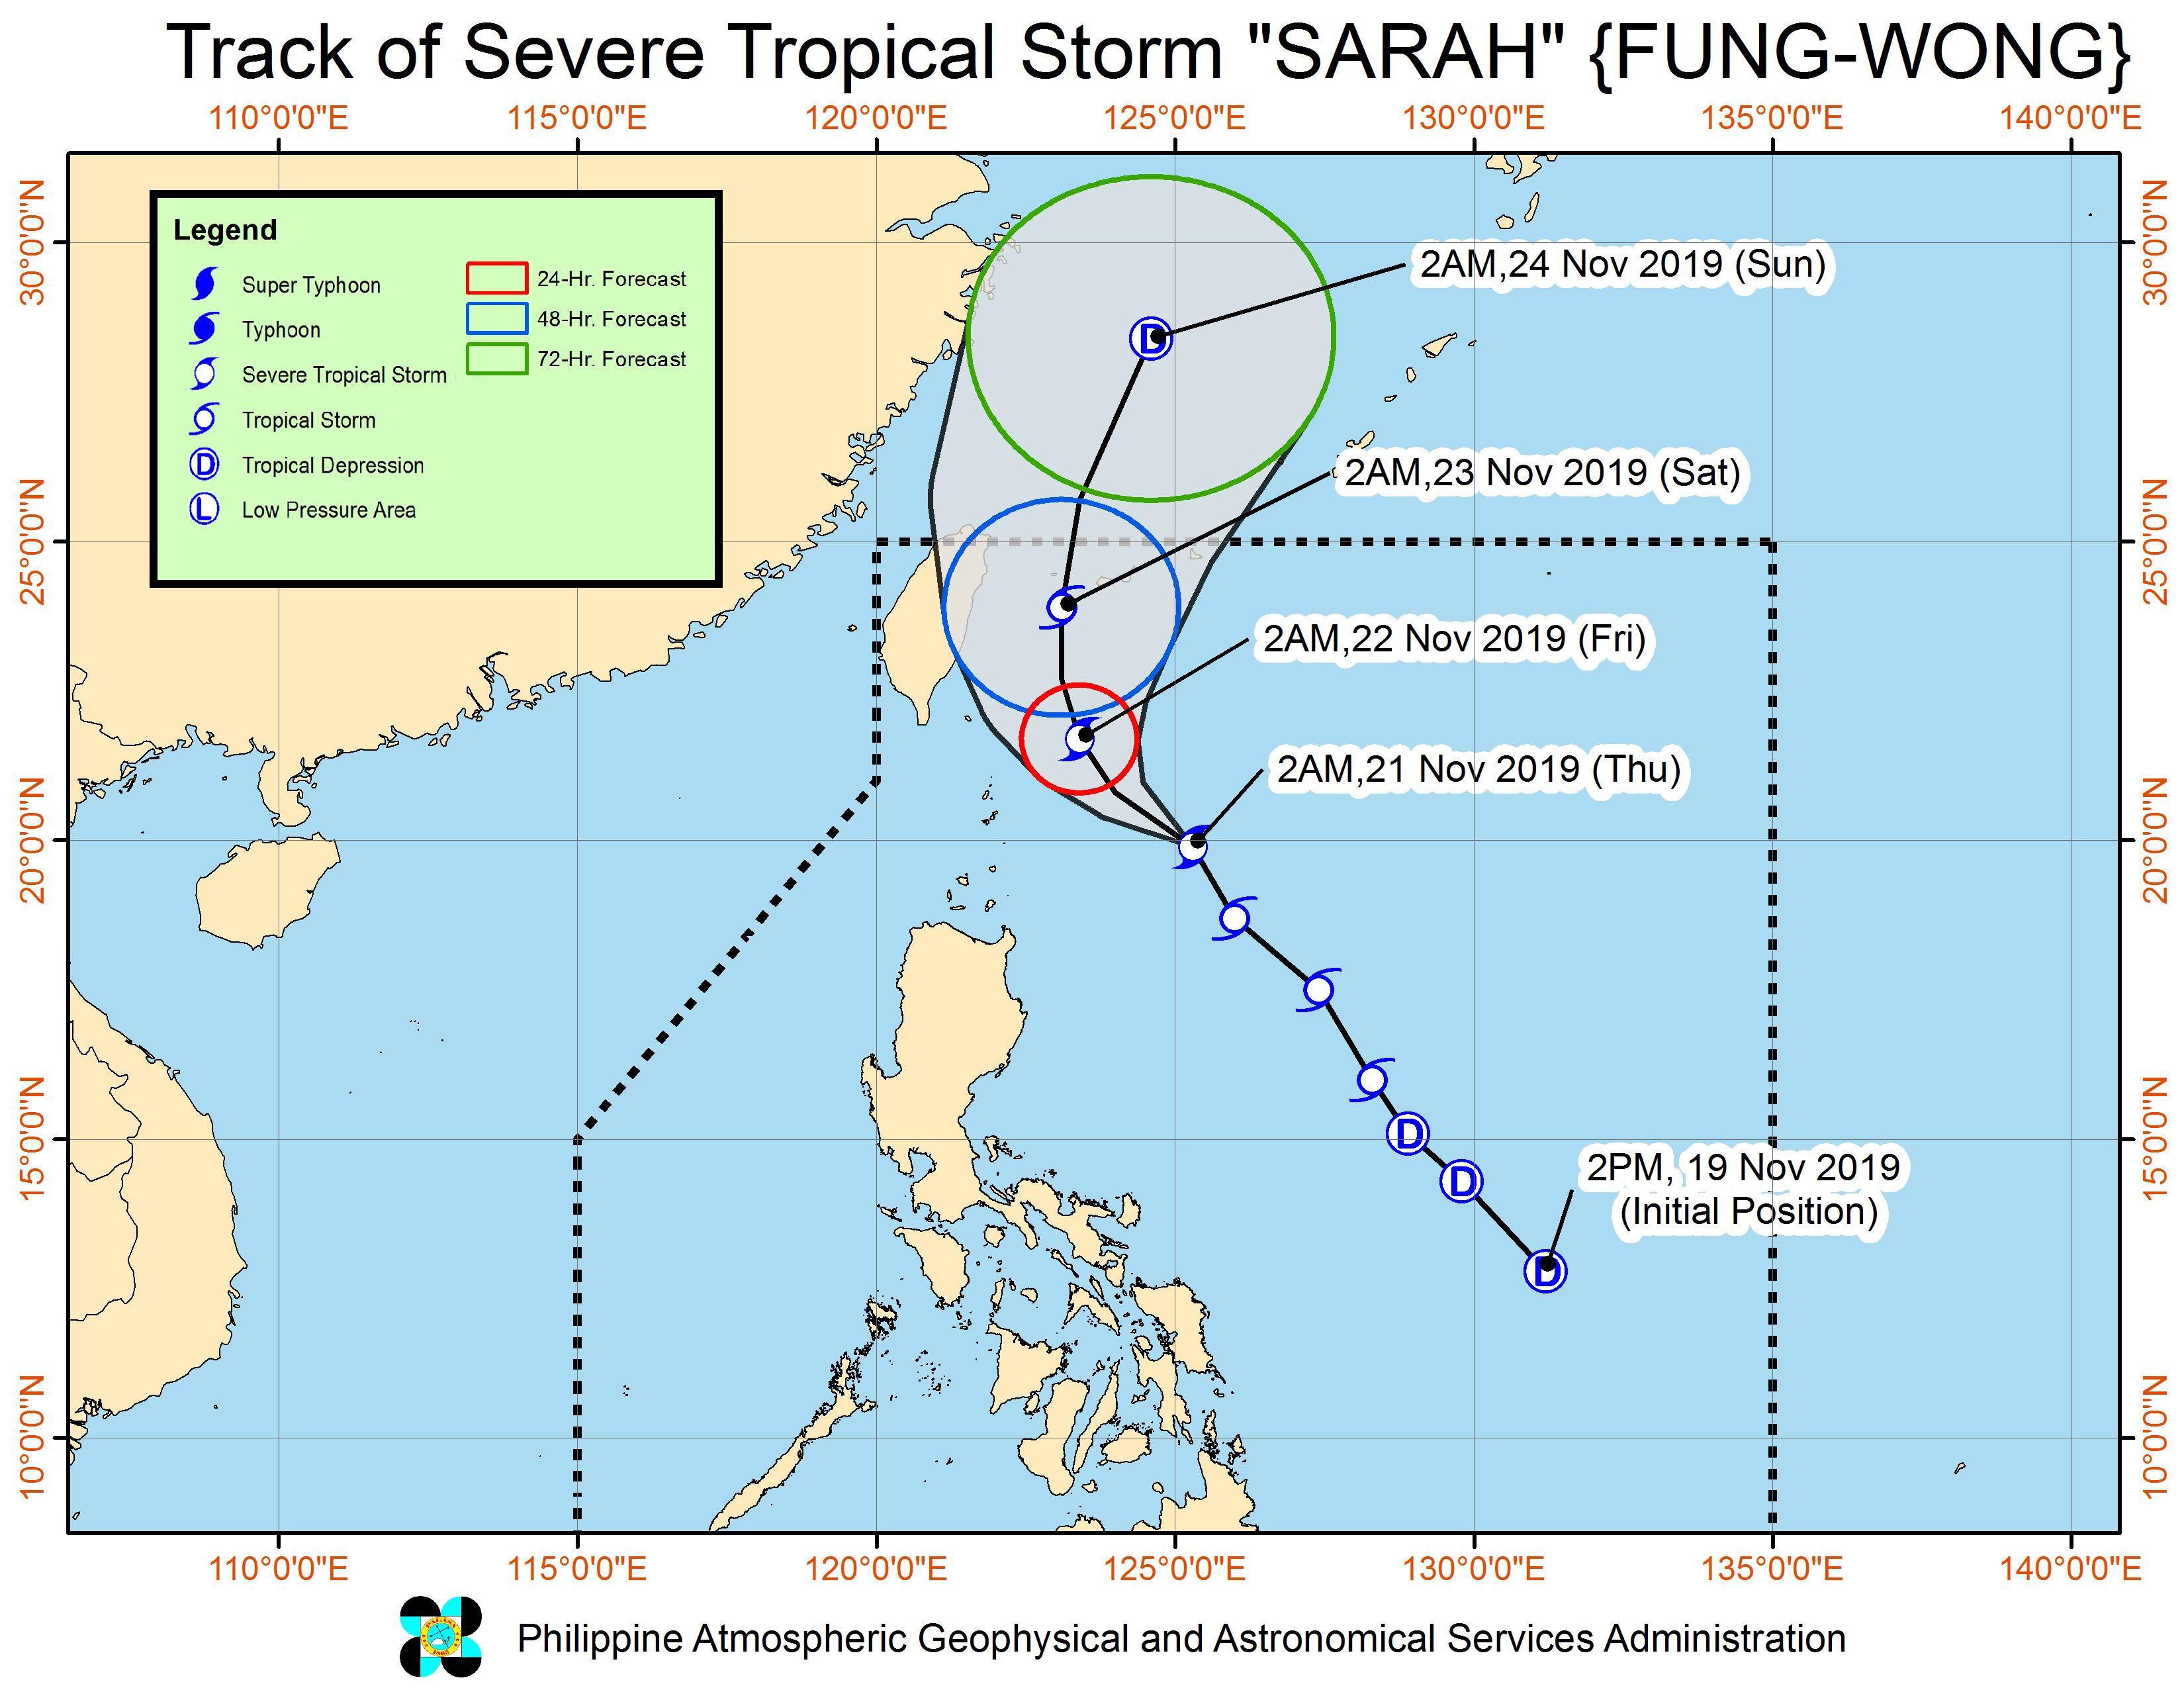 Forecast track of Severe Tropical Storm Sarah (Fung-wong) as of November 21, 2019, 5 am. Image from PAGASA